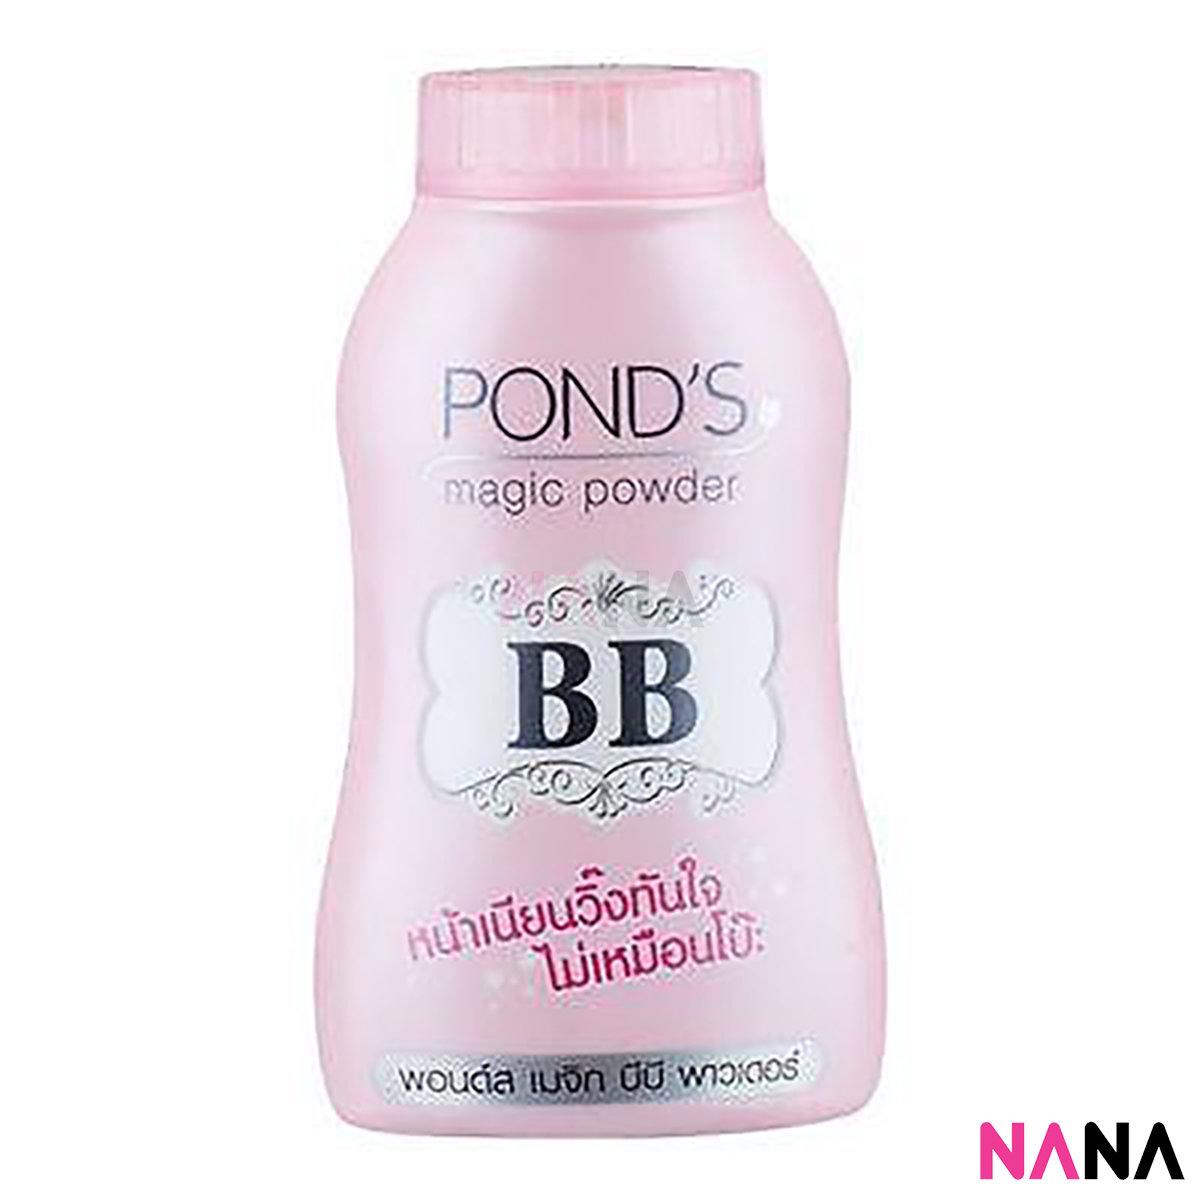 Magic powder BB 50g